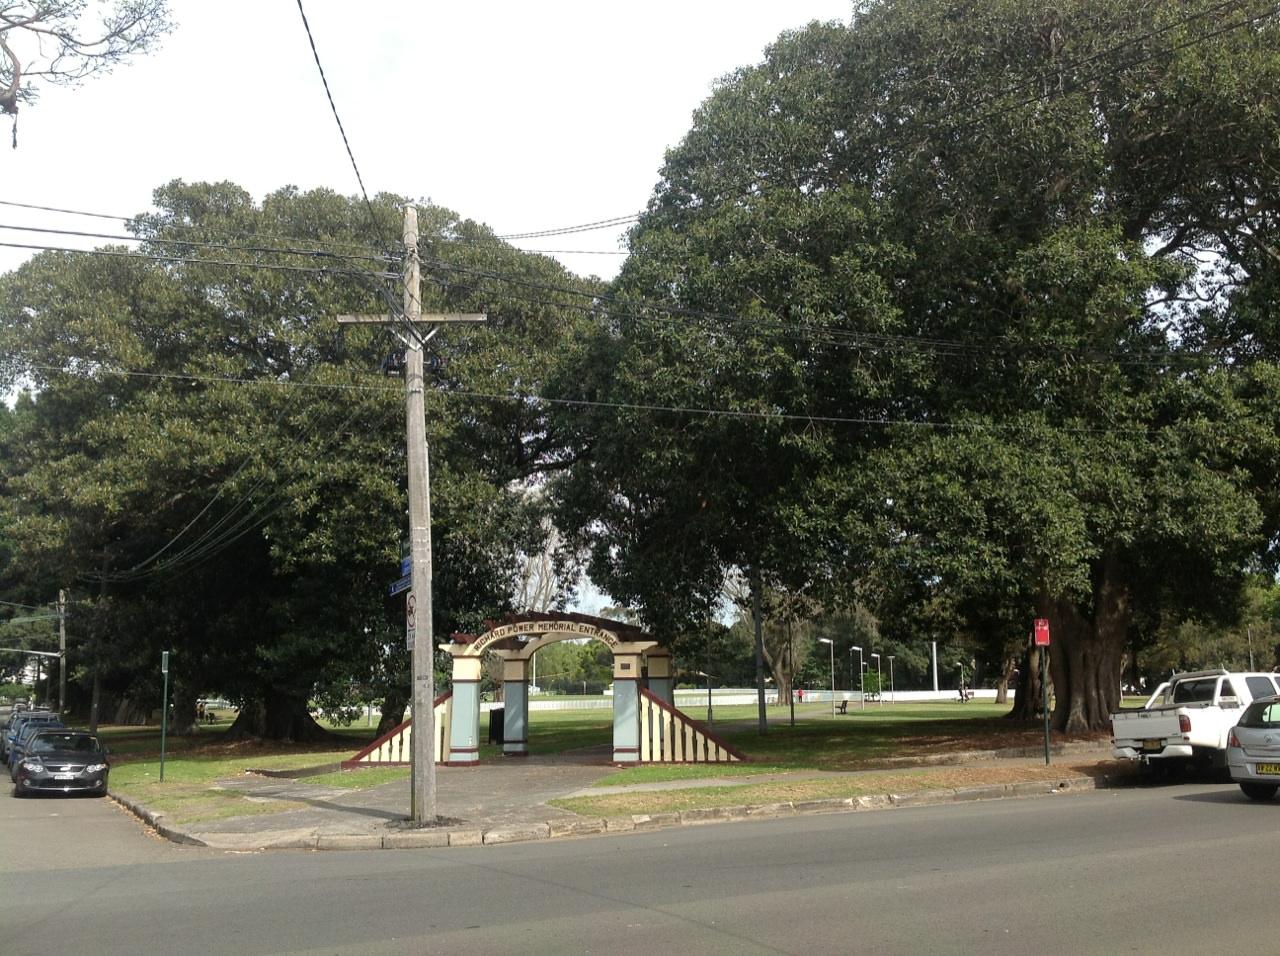 Port Jackson and Moreton Bay Figs